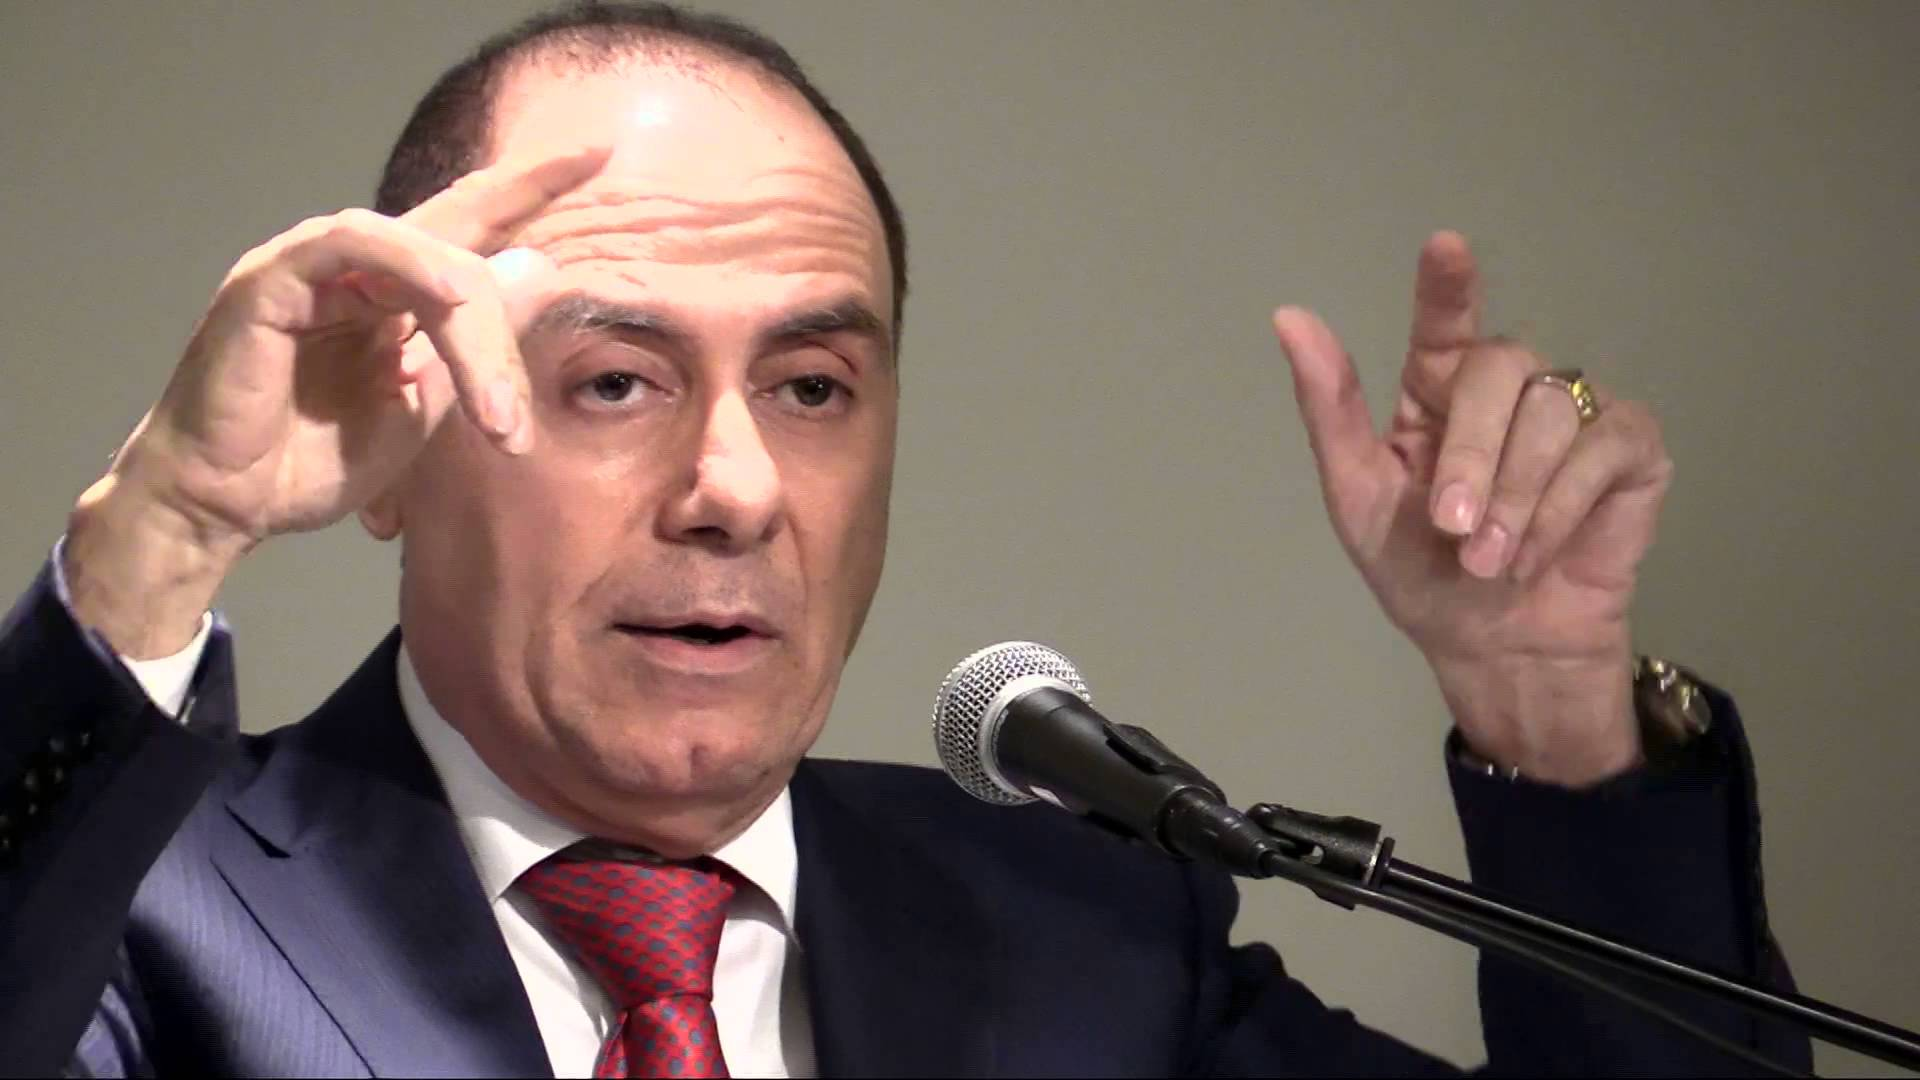 Israel's interior minister Silvan Shalom resigns